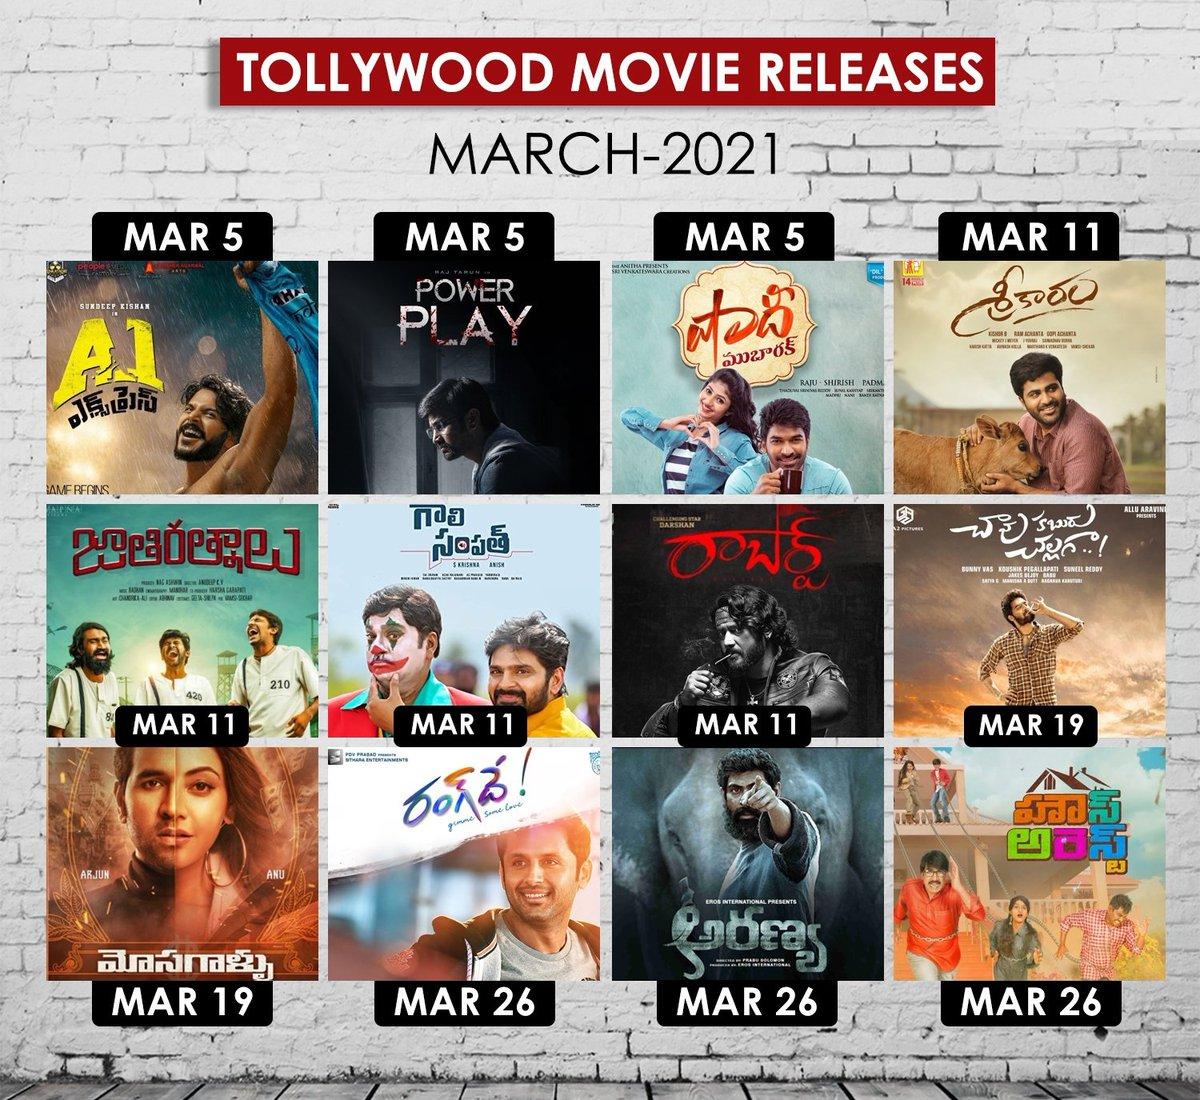 🎇Take a Look at the #March 🎫 Upcoming Telugu Movie Releases🍟🥡🎇  #A1Express 👉🏼5 #PowerPlay 👉🏼5 #ShaadiMubarak 👉🏼5  #Sreekaram 👉🏼11 #JathiRatnalu 👉🏼11 #GaaliSampath 👉🏼11  #Roberrt 👉🏼11   #chavukaburuchallaga 👉🏼19 #Mosagallu 👉🏼19   #TeluguUpcomingMovies #2021Movies #March2021